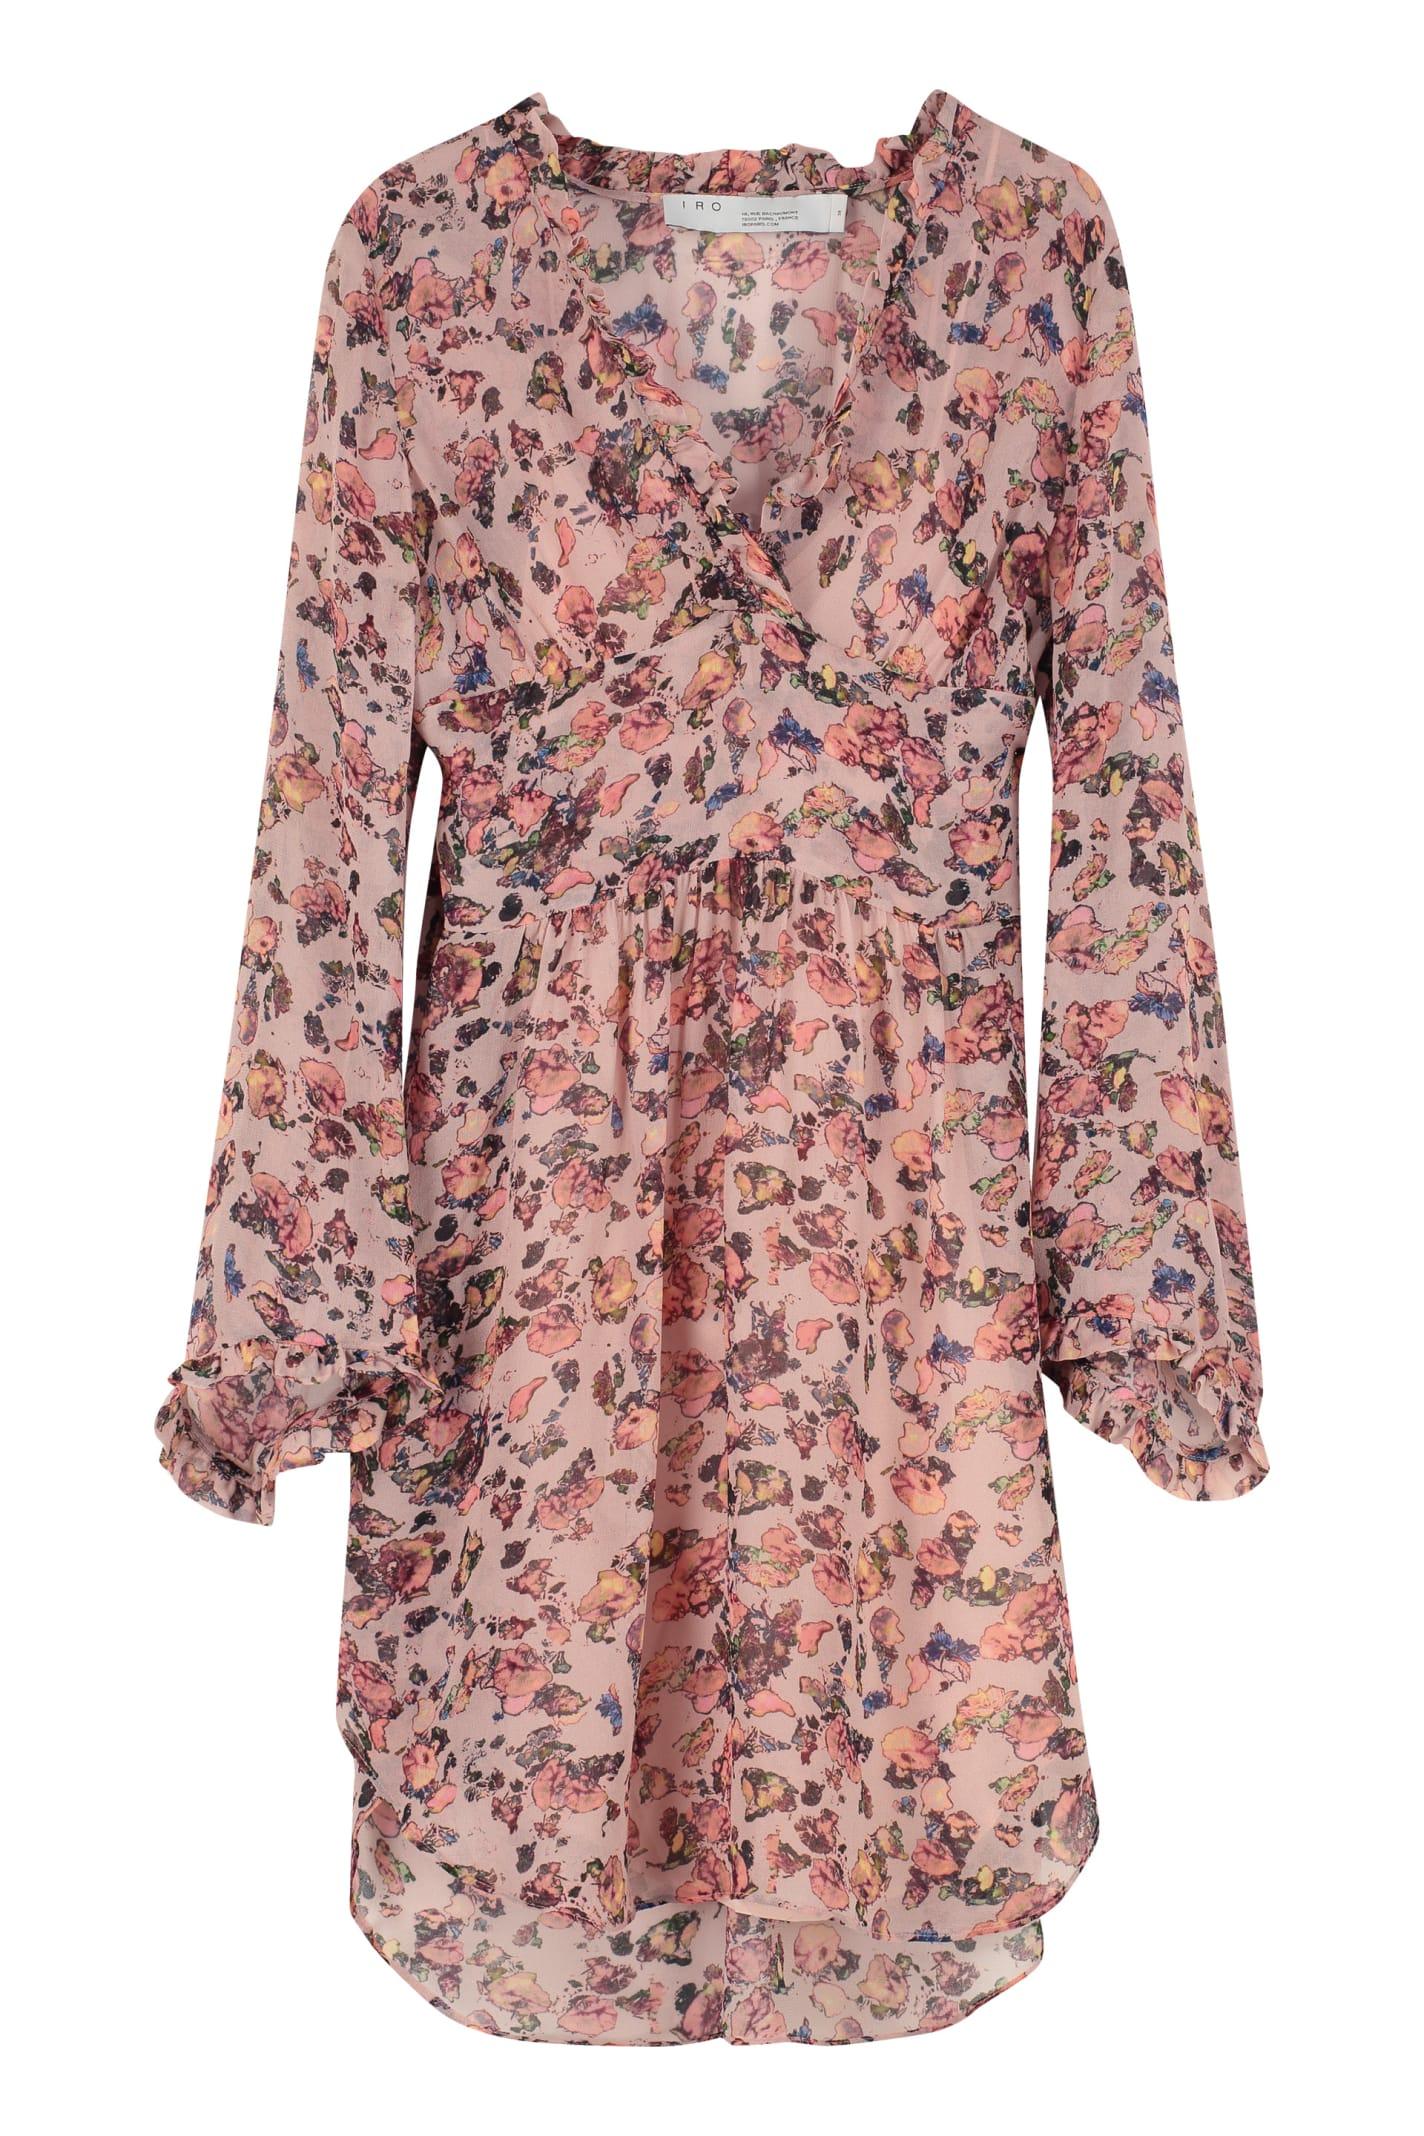 Photo of  IRO Printed Dress With Wrinkles- shop IRO  online sales